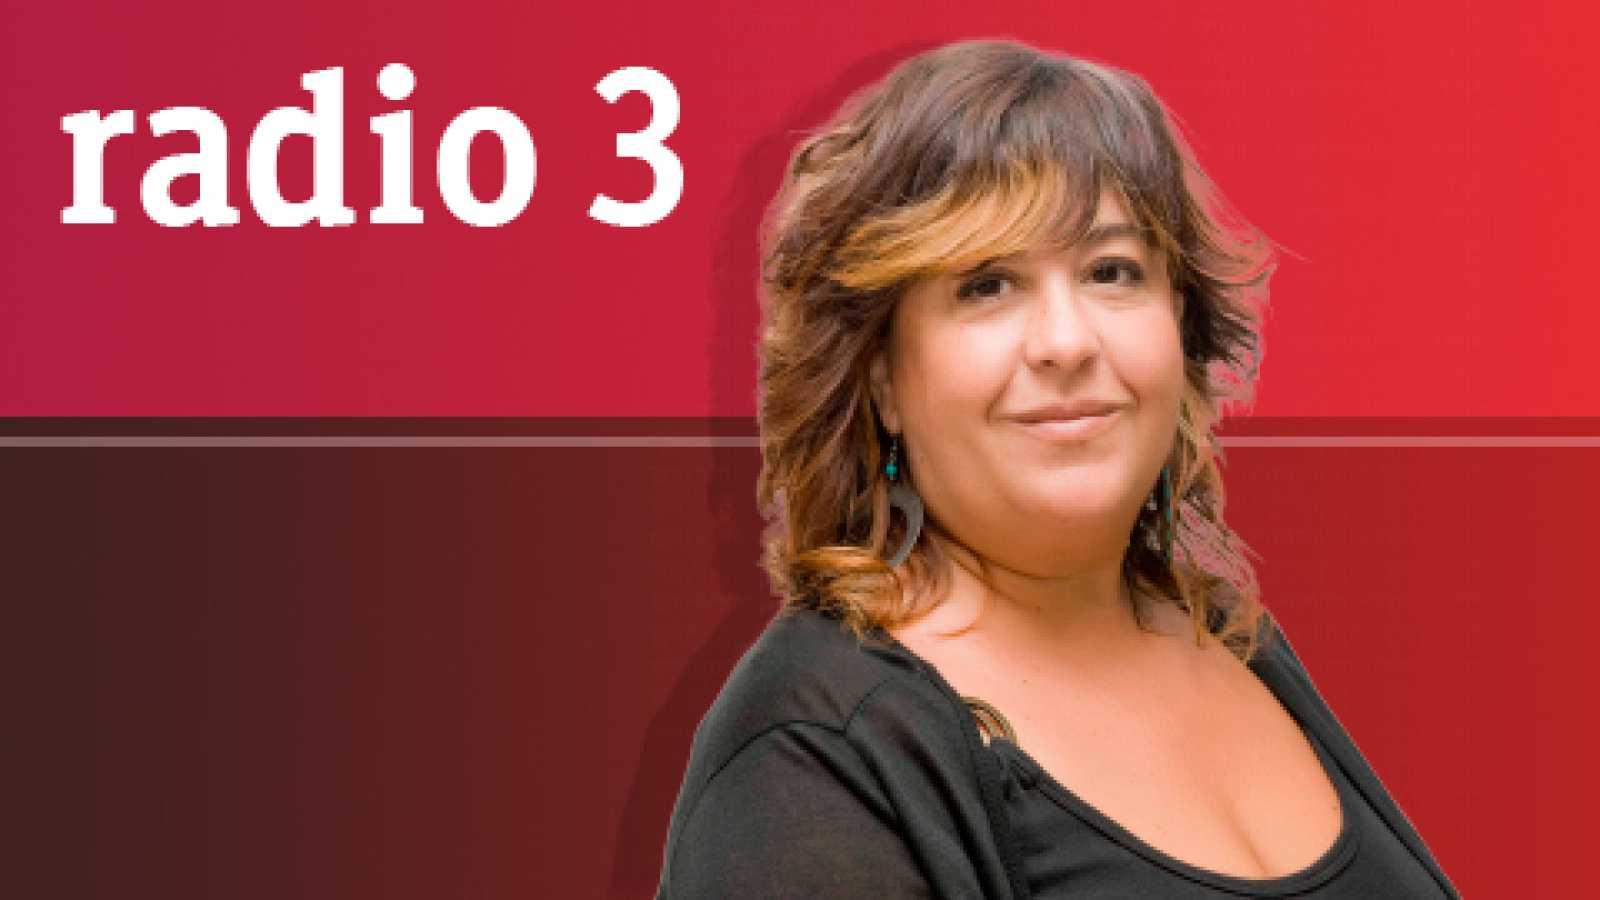 El gran quilombo - 28/11/20 - escuchar ahora